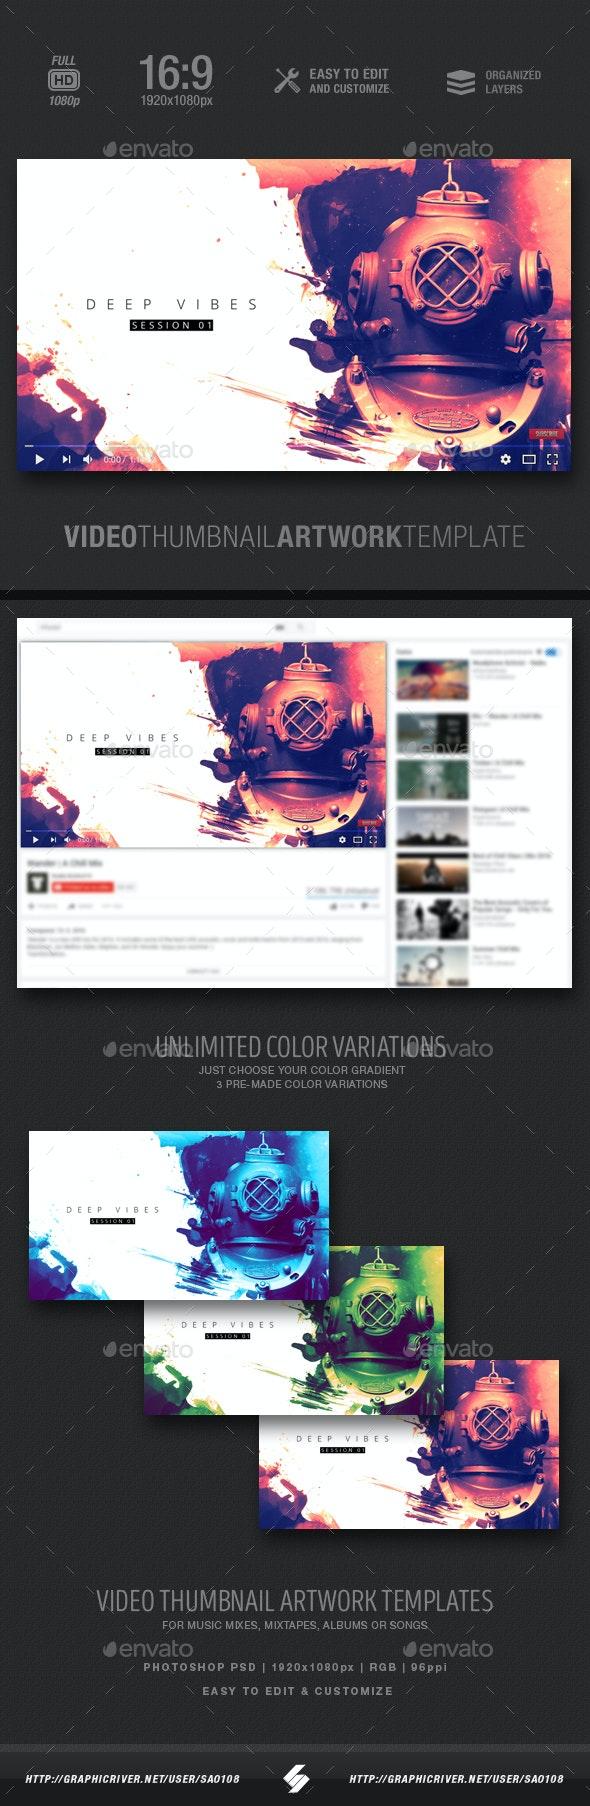 Deep Vibes - Video Thumbnail Artwork Template - YouTube Social Media